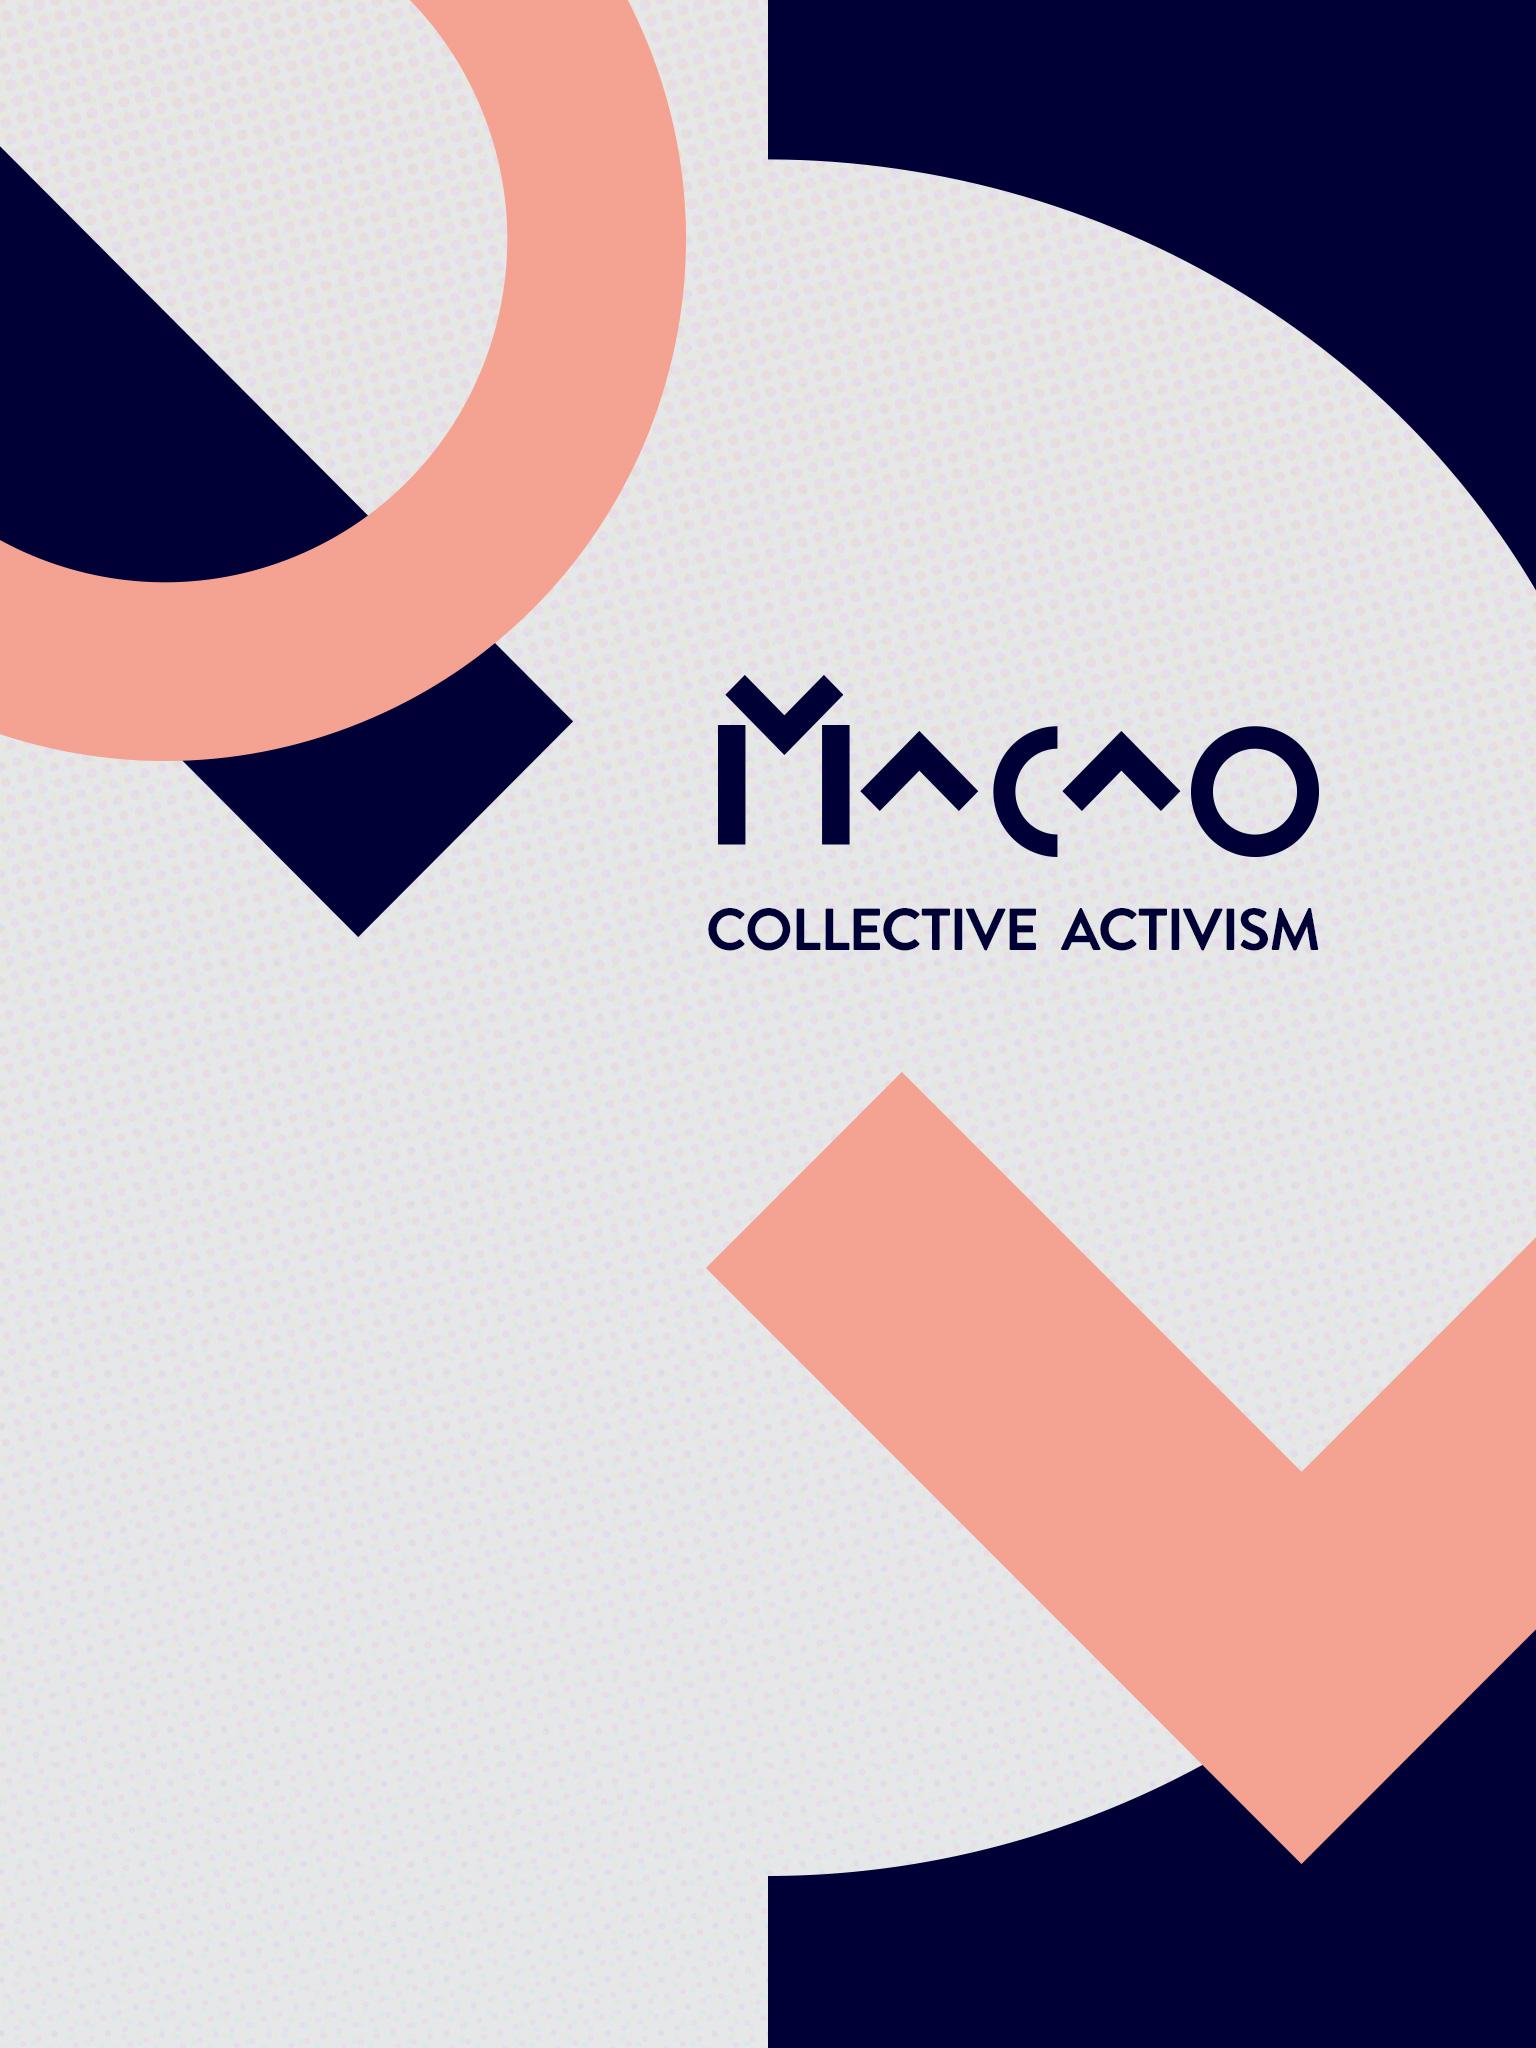 Macao: Collective activism